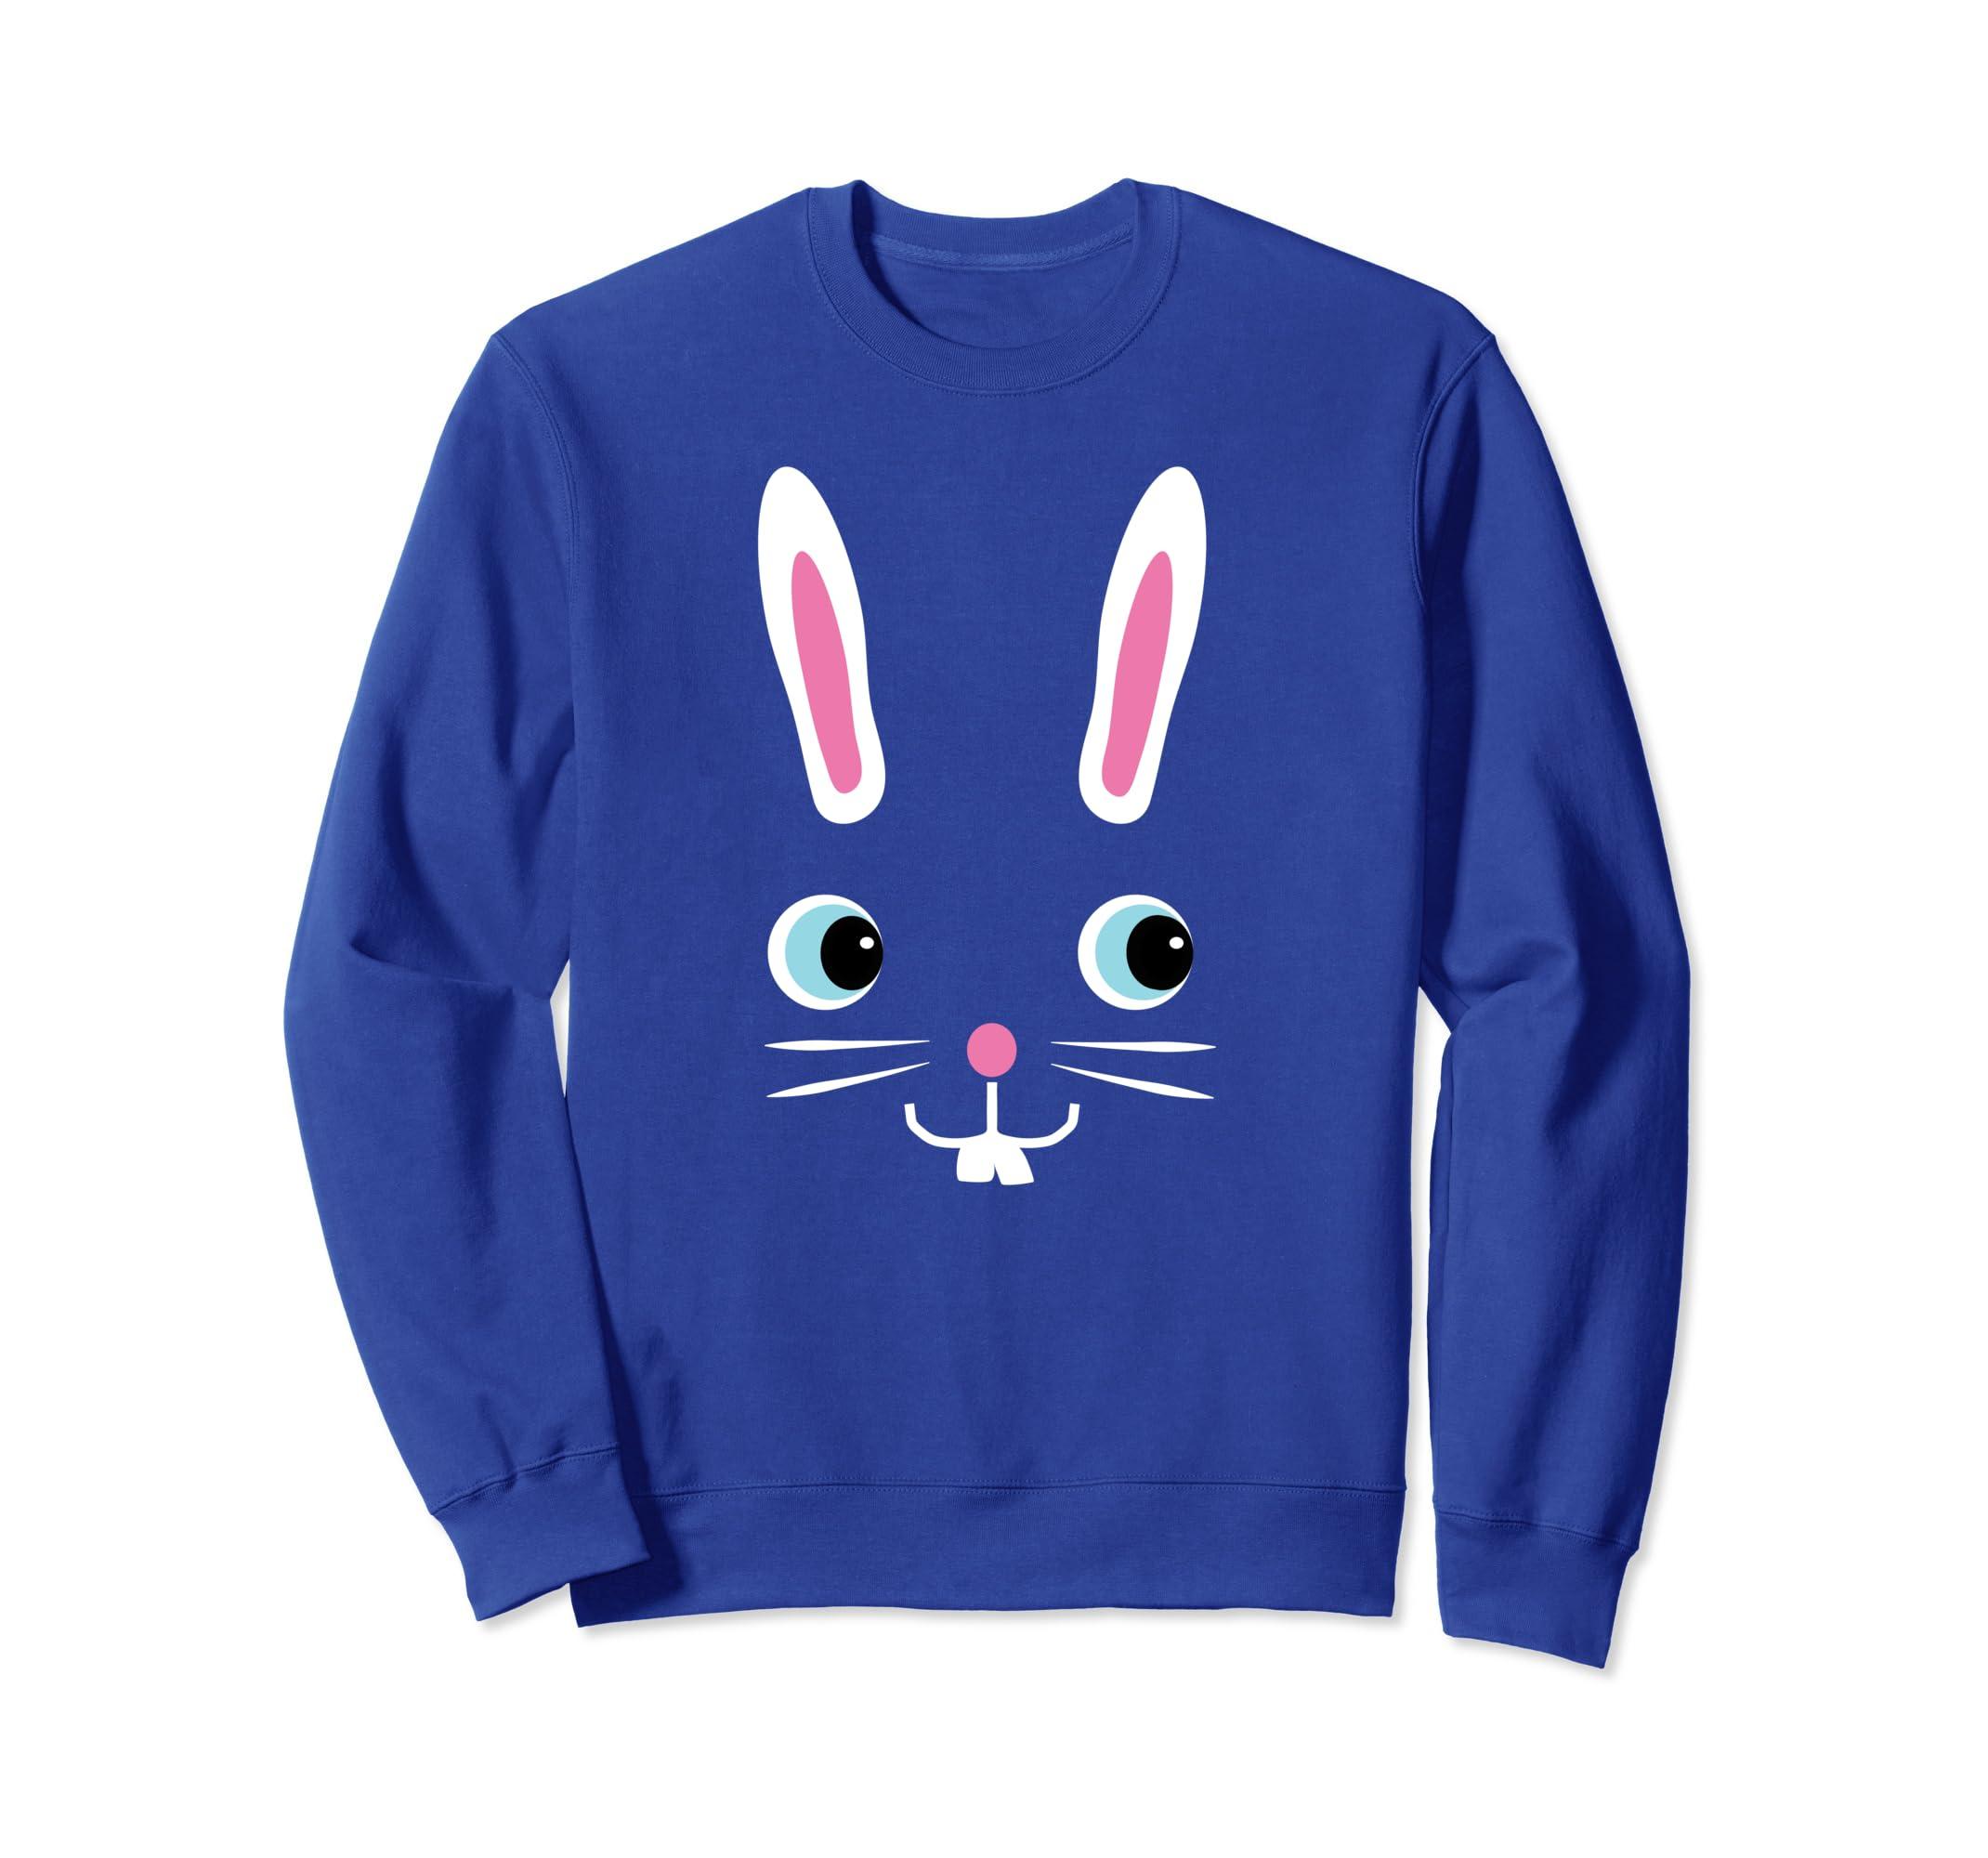 81db23dedf Amazon.com: Easter Bunny Sweatshirt Cute Trendy Bunny Face Shirts: Clothing